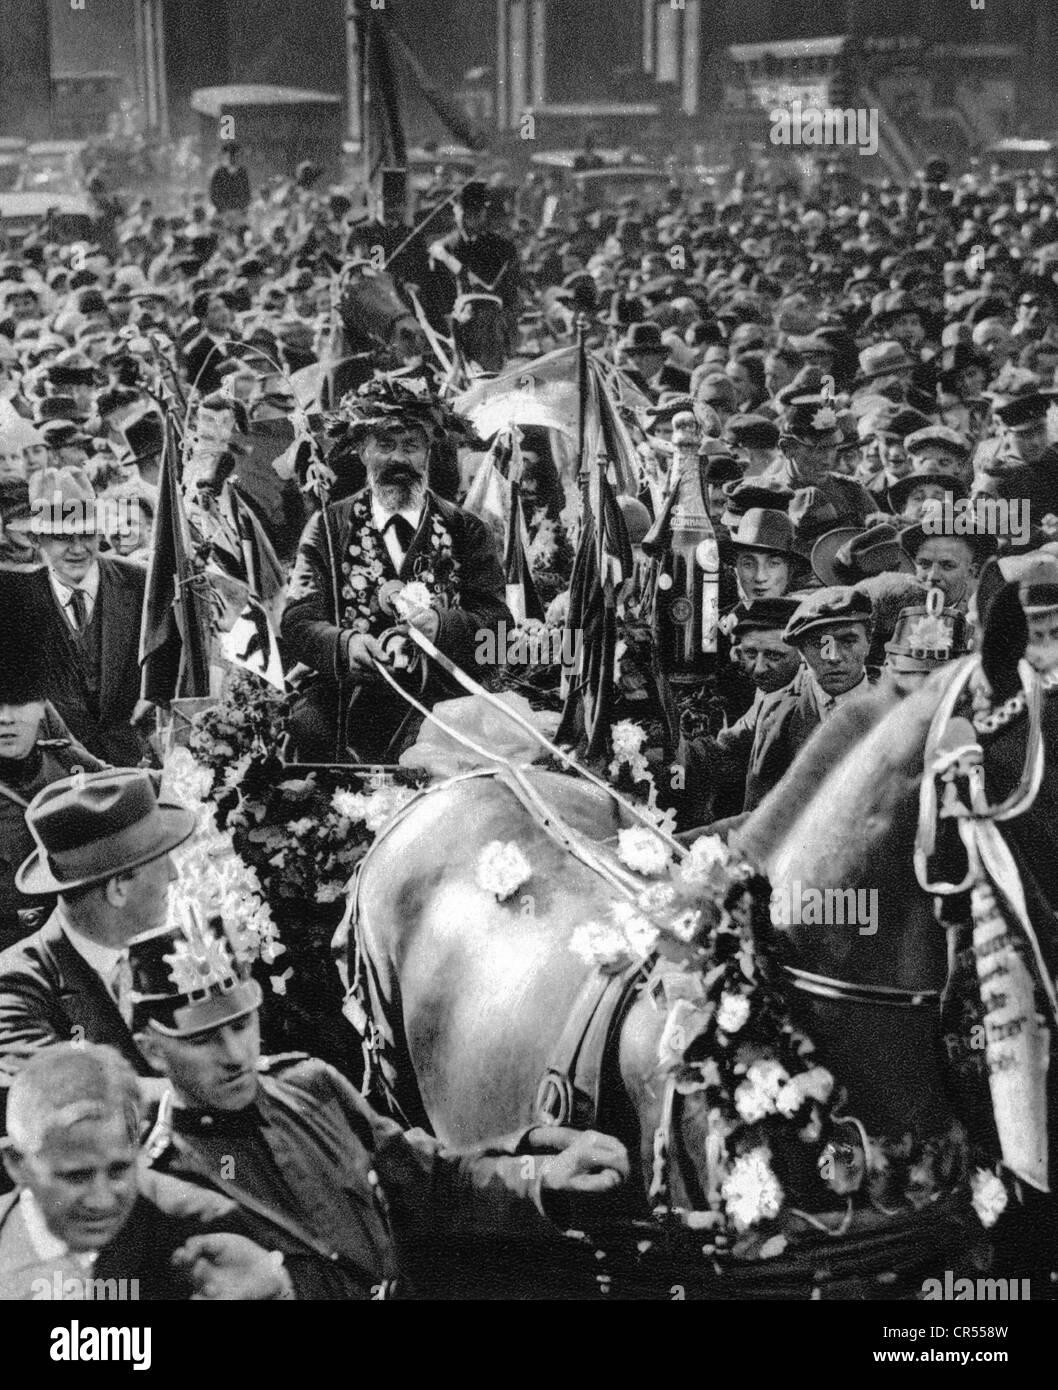 Hartmann, Gustav, 4.8.1859 - 23.12.1938, Berlin coachman, called 'The Iron Gustav', arrival in Berlin, 1928, - Stock Image